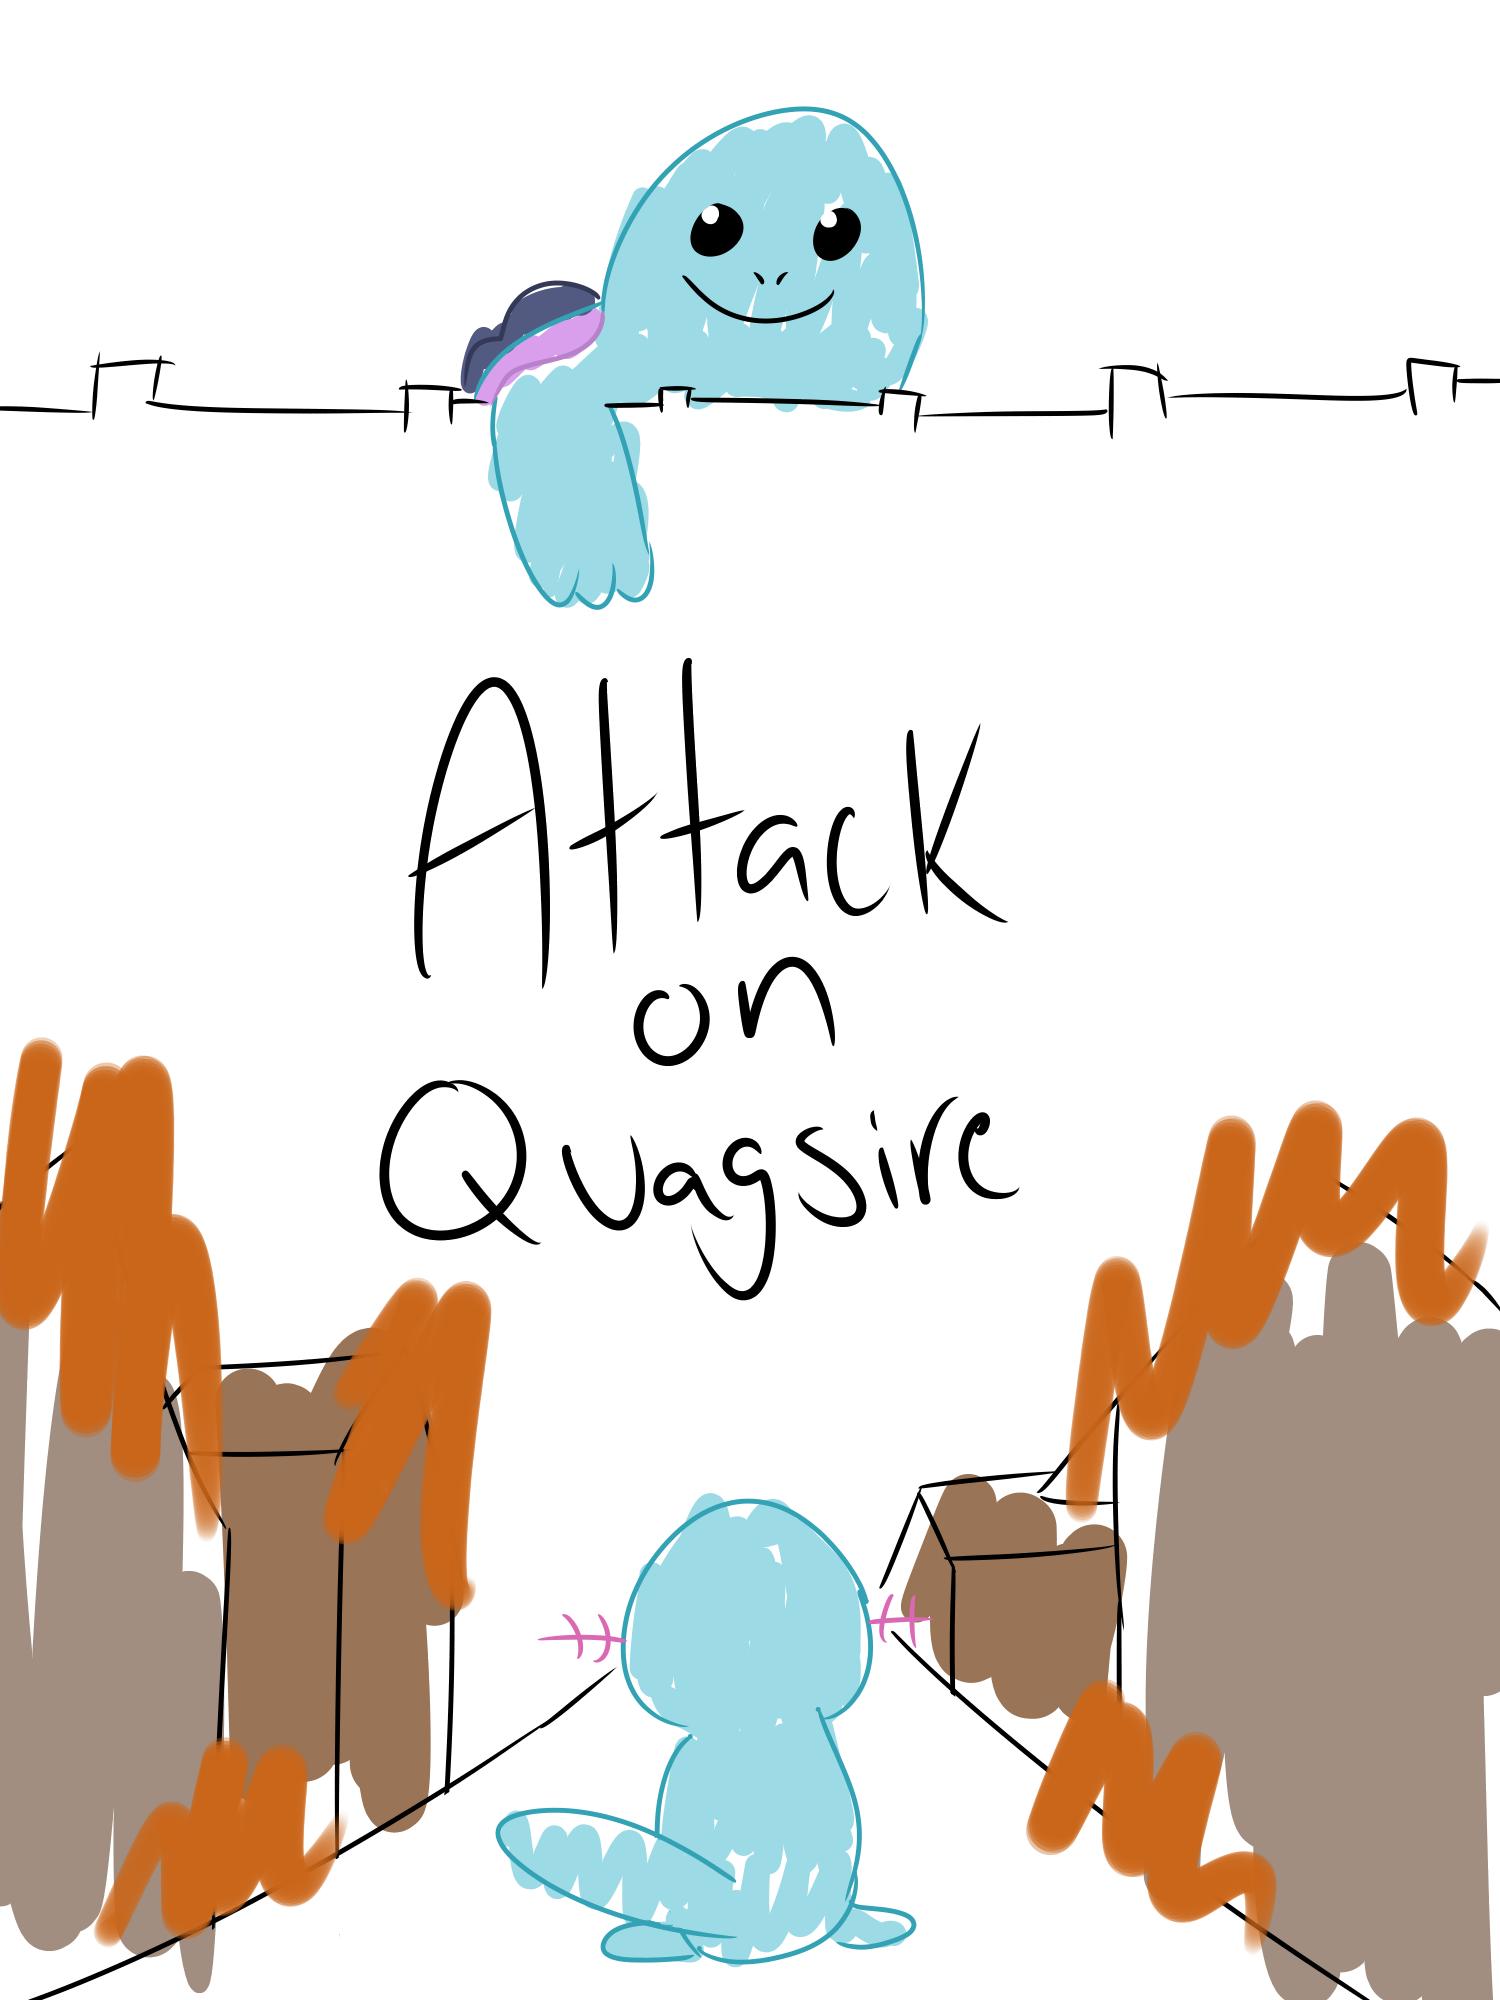 attackonquag.png